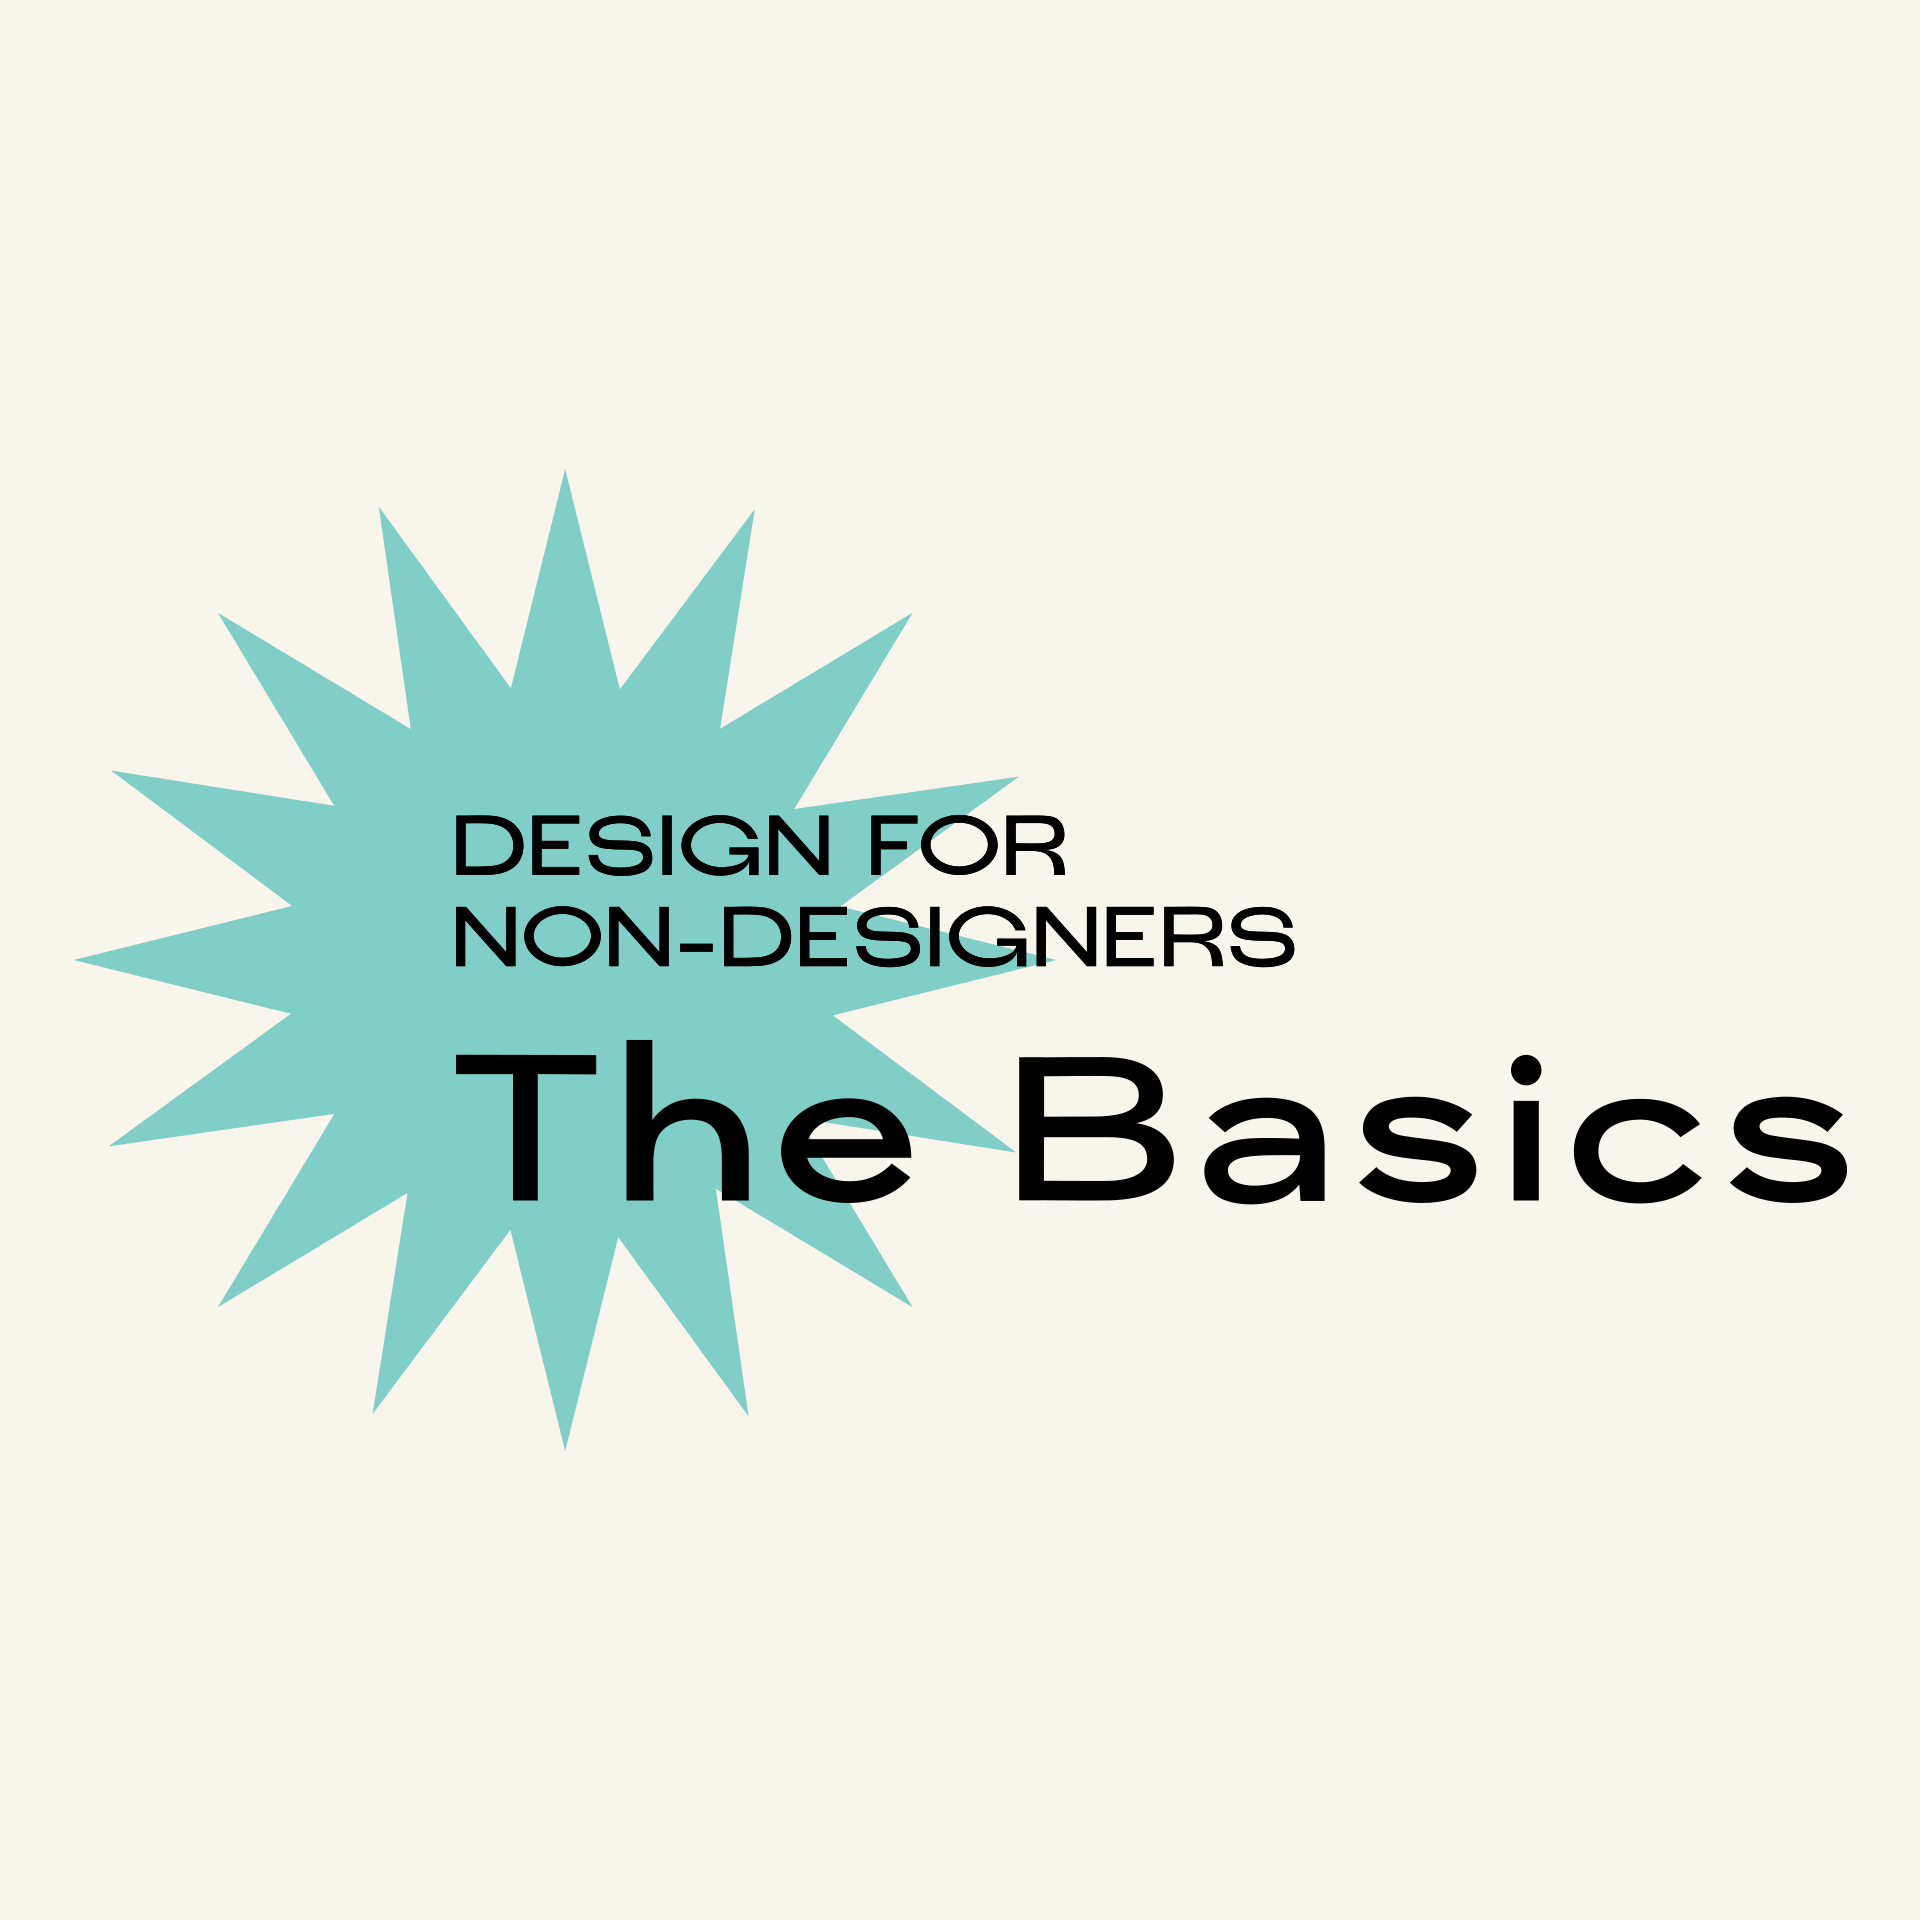 MODA_1 The Basics.jpg